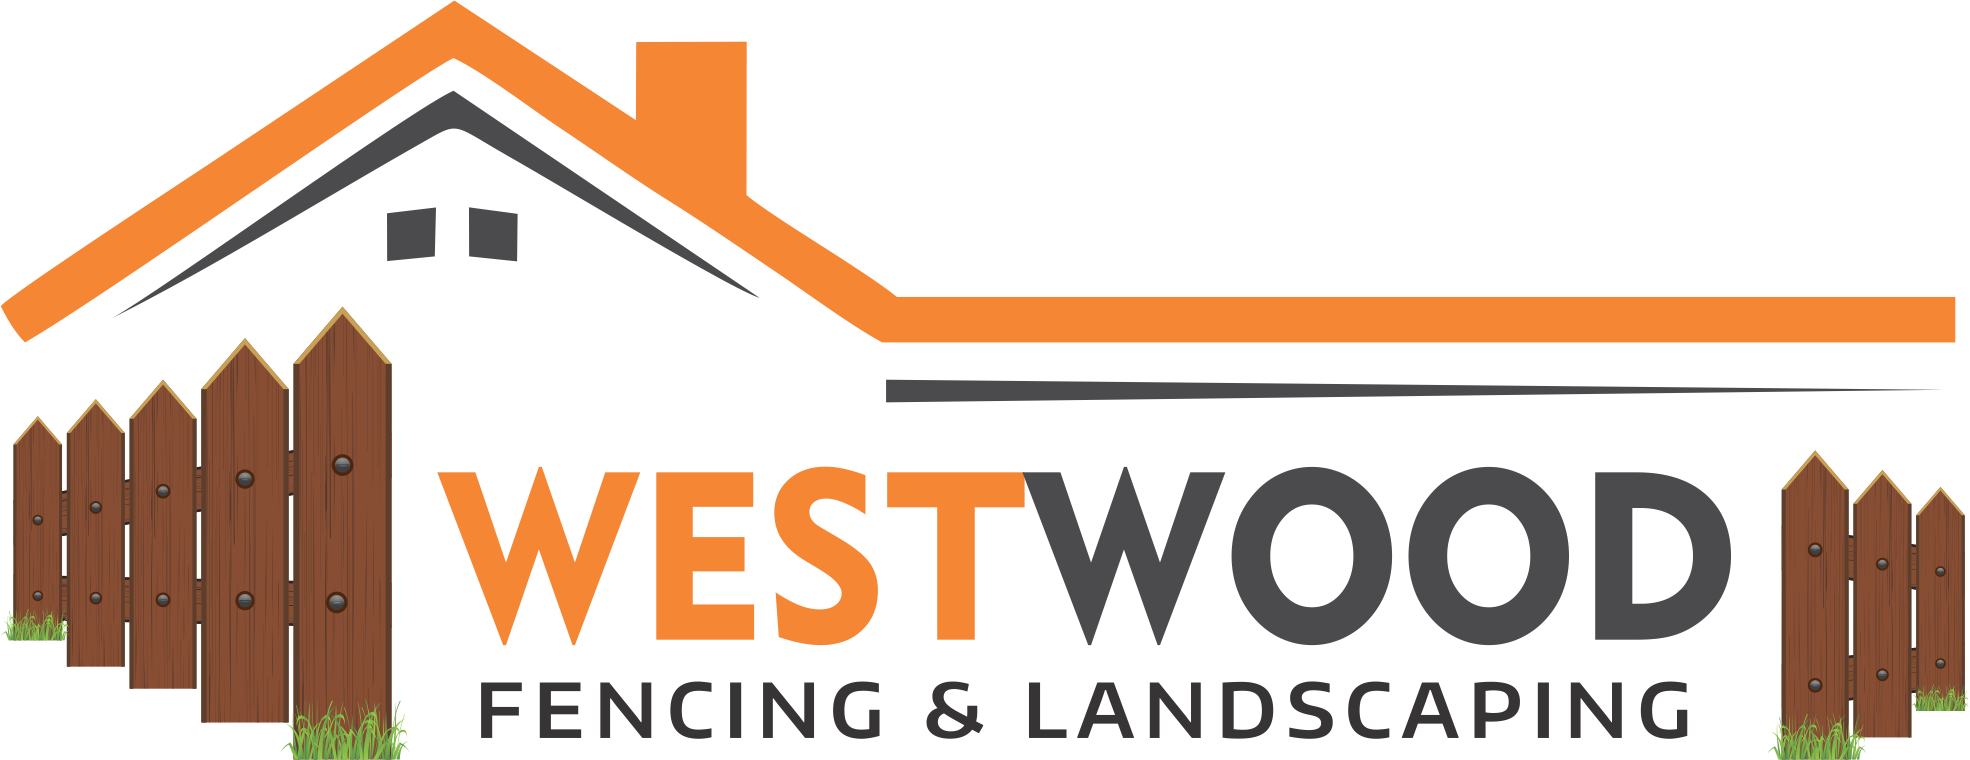 Westwood fencing & landscaping